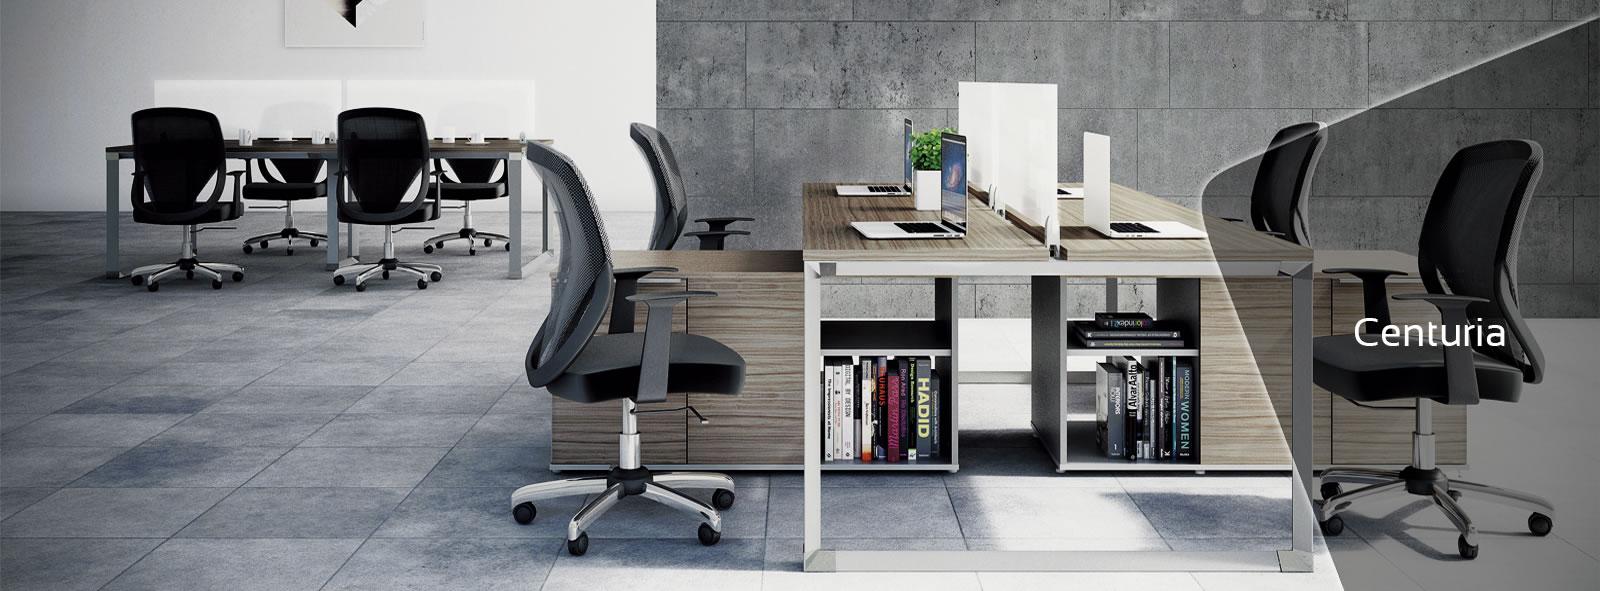 muebles de oficina en aguascalientes quer taro le n